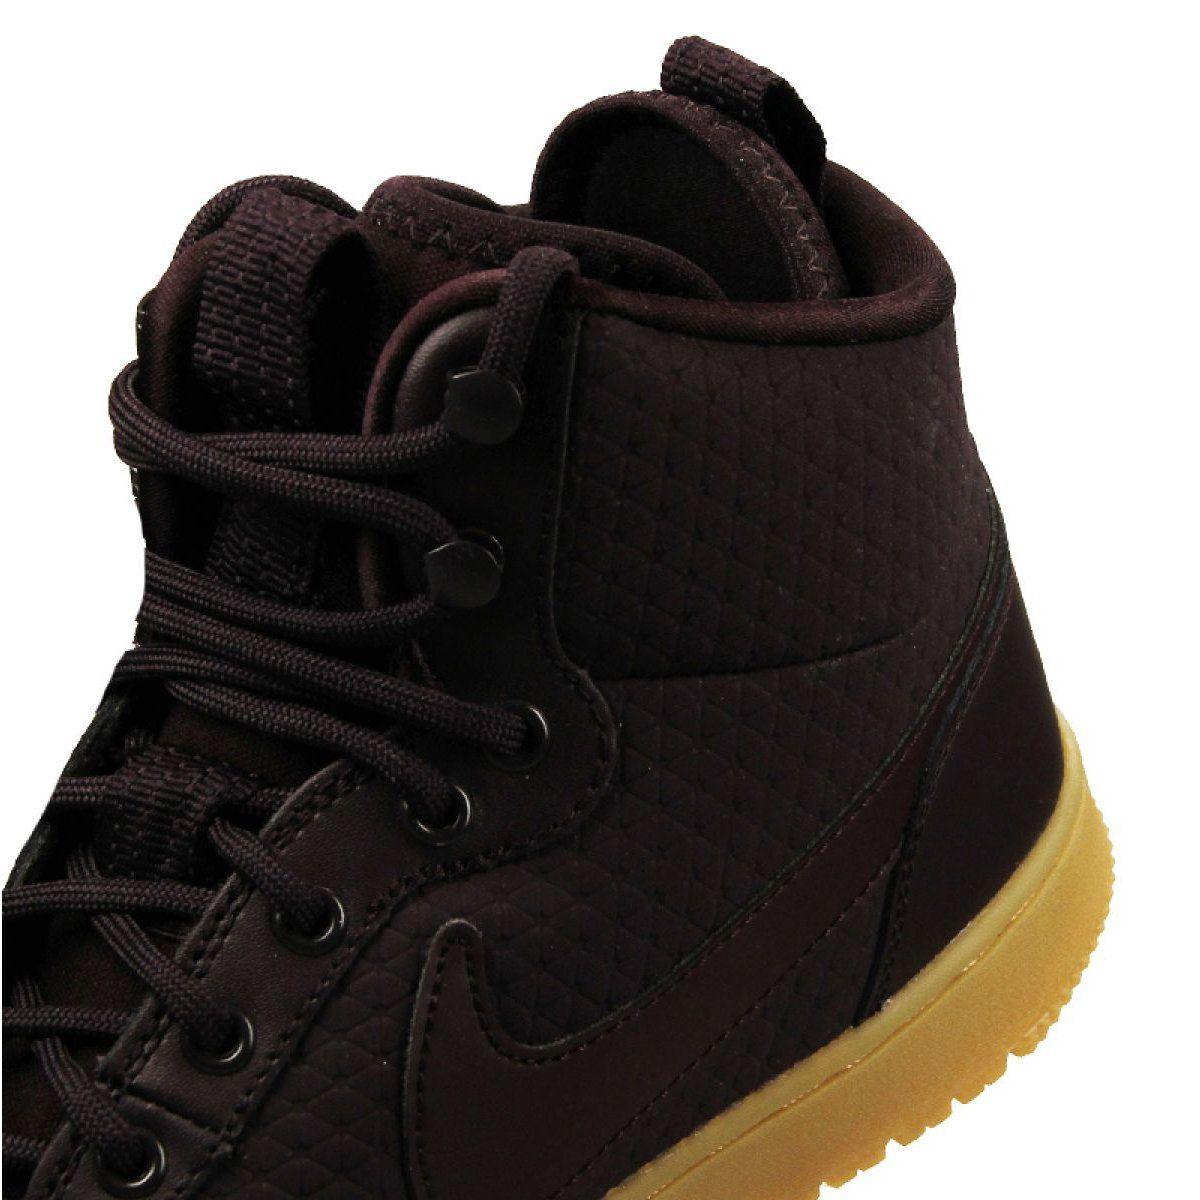 Nike Ebernon Mid Winter M Aq8754 600 Shoes Shoes Mens Nike Shoes Nike